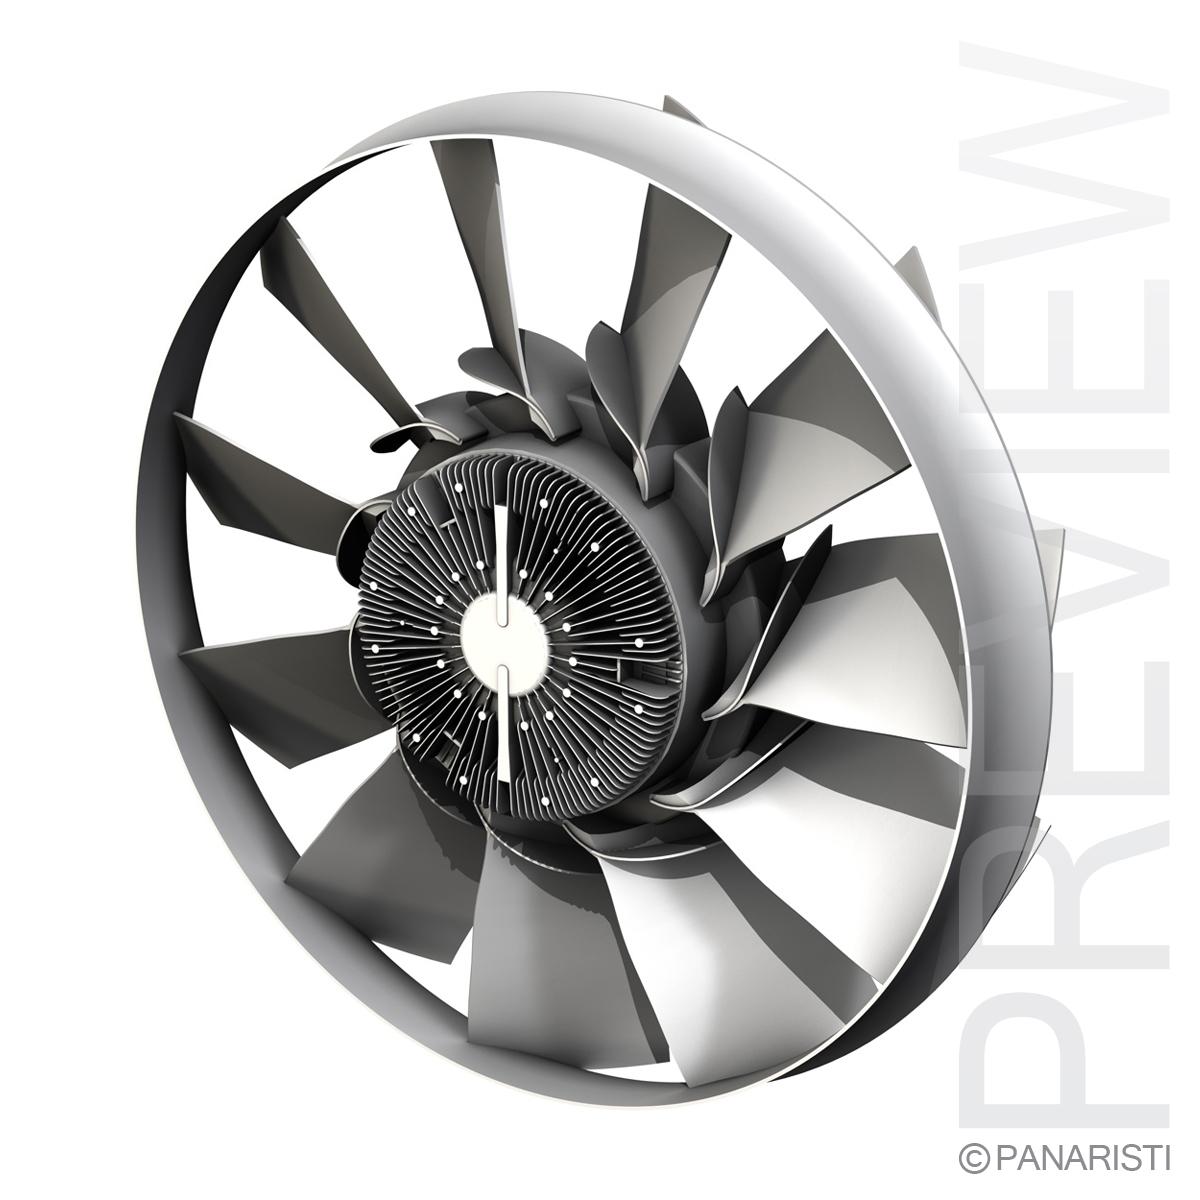 Engine cooling fan 2 3d model 3ds c4d lwo lws lw obj 129281